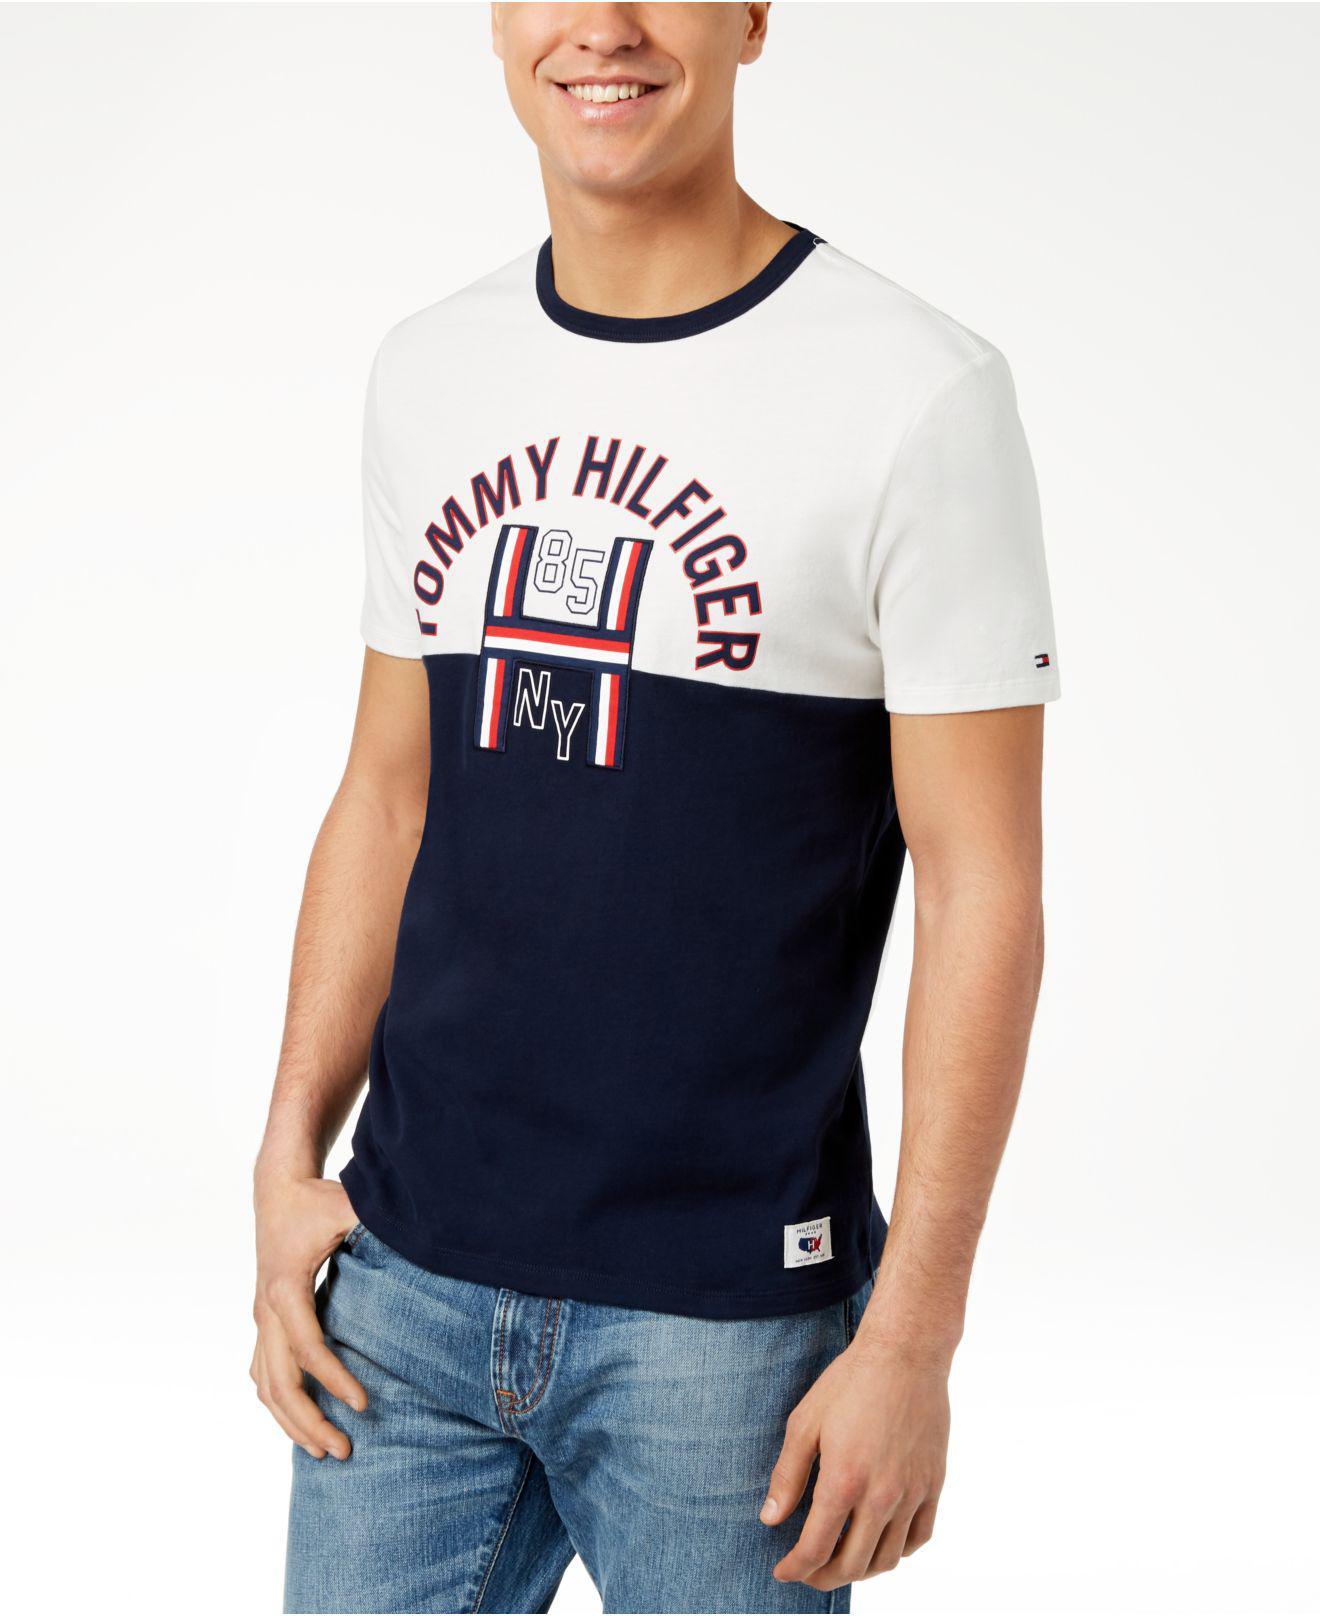 7d128b8a15a8b Tommy Hilfiger Mens Old Skool Graphic Print T Shirt – Rockwall Auction